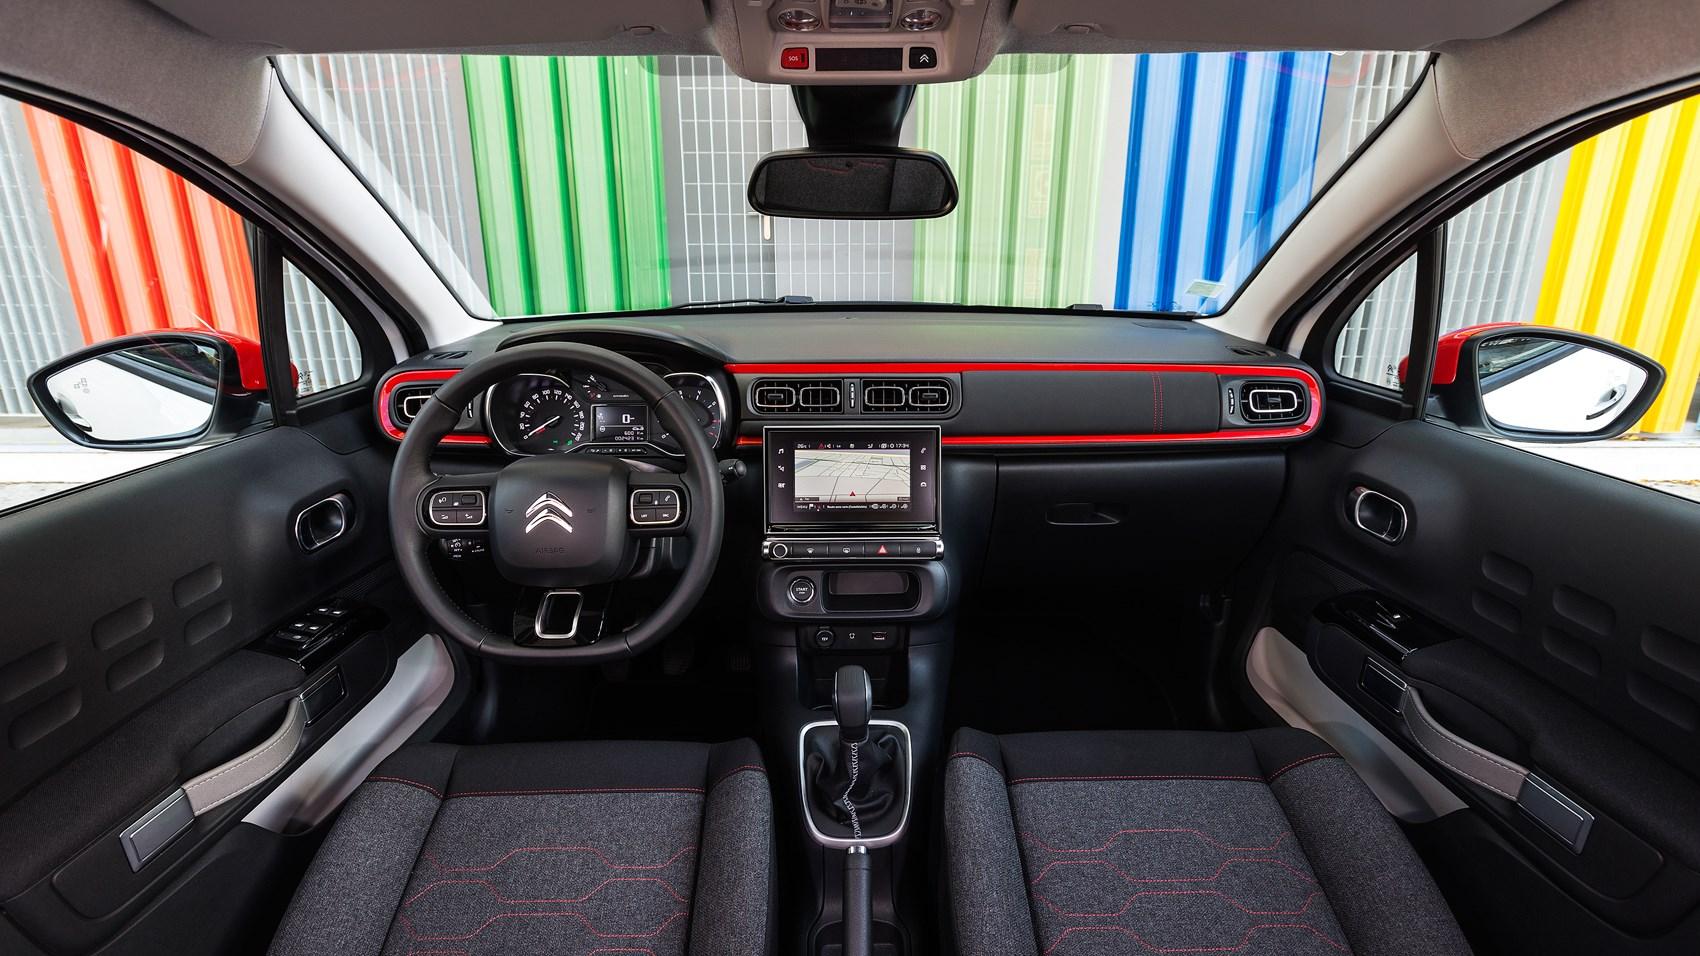 citroen c3 puretech 110 s s flair 2016 review by car. Black Bedroom Furniture Sets. Home Design Ideas